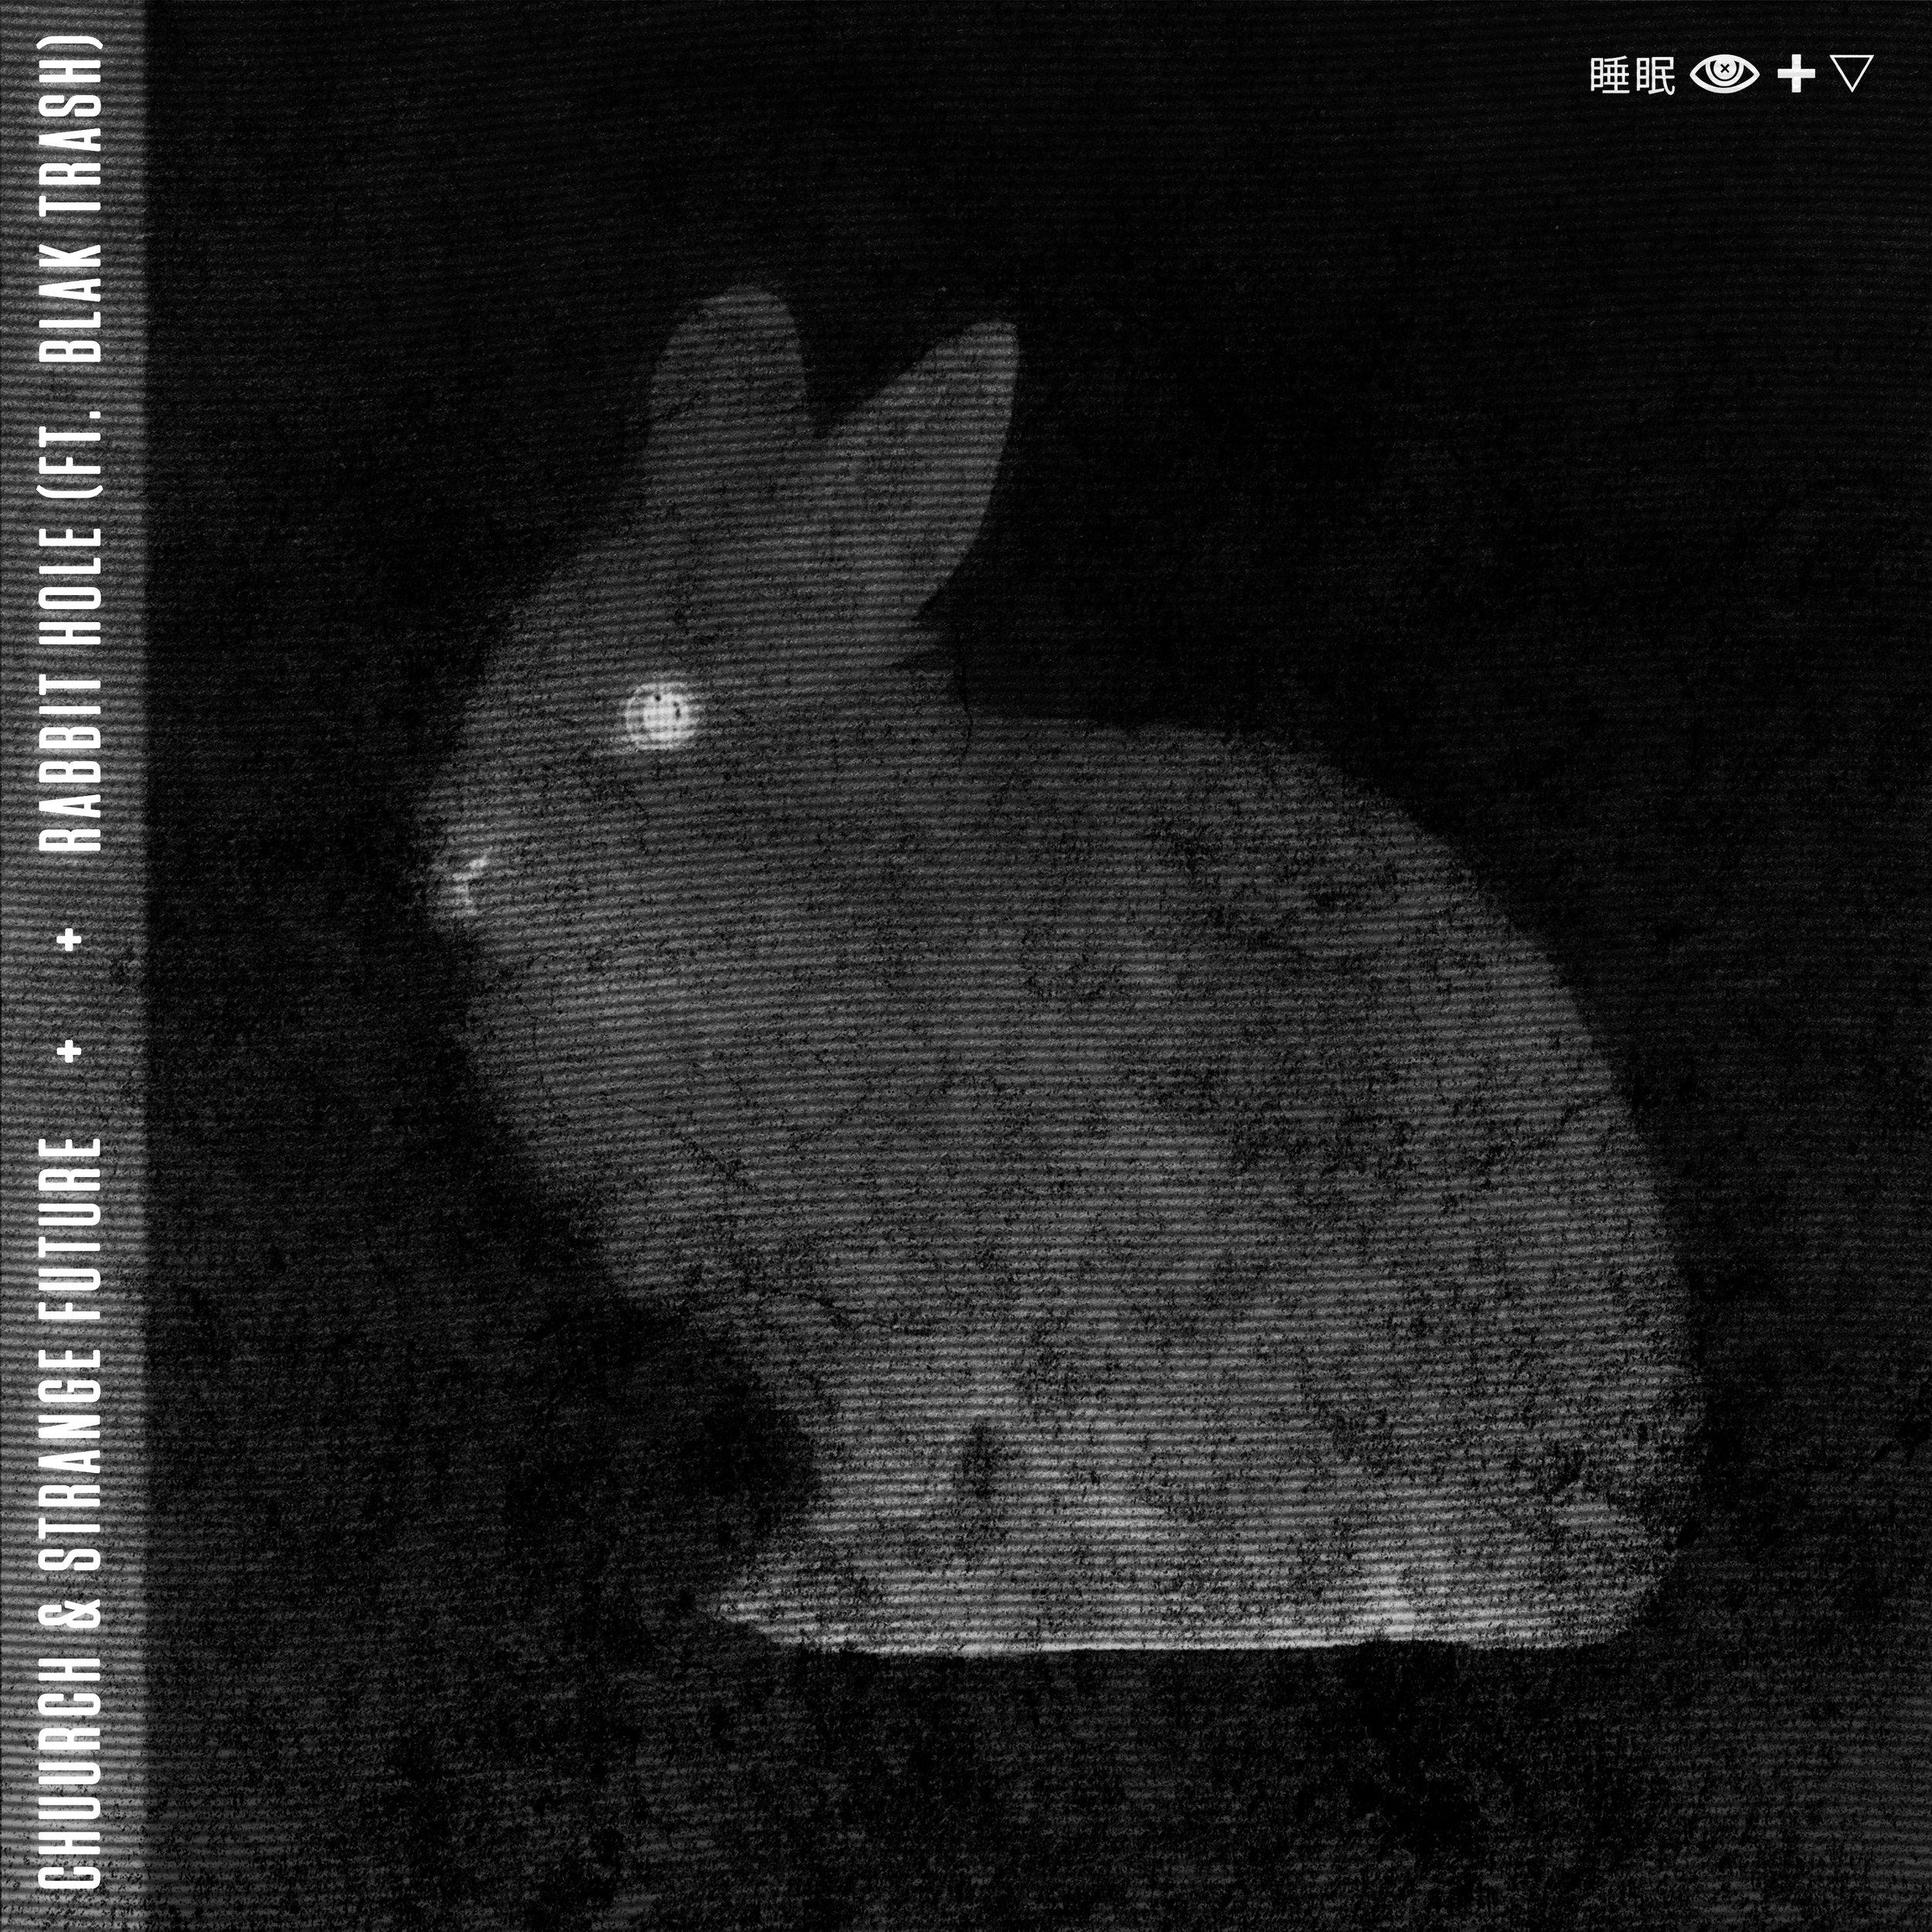 rabbit-hole-artwork.jpg